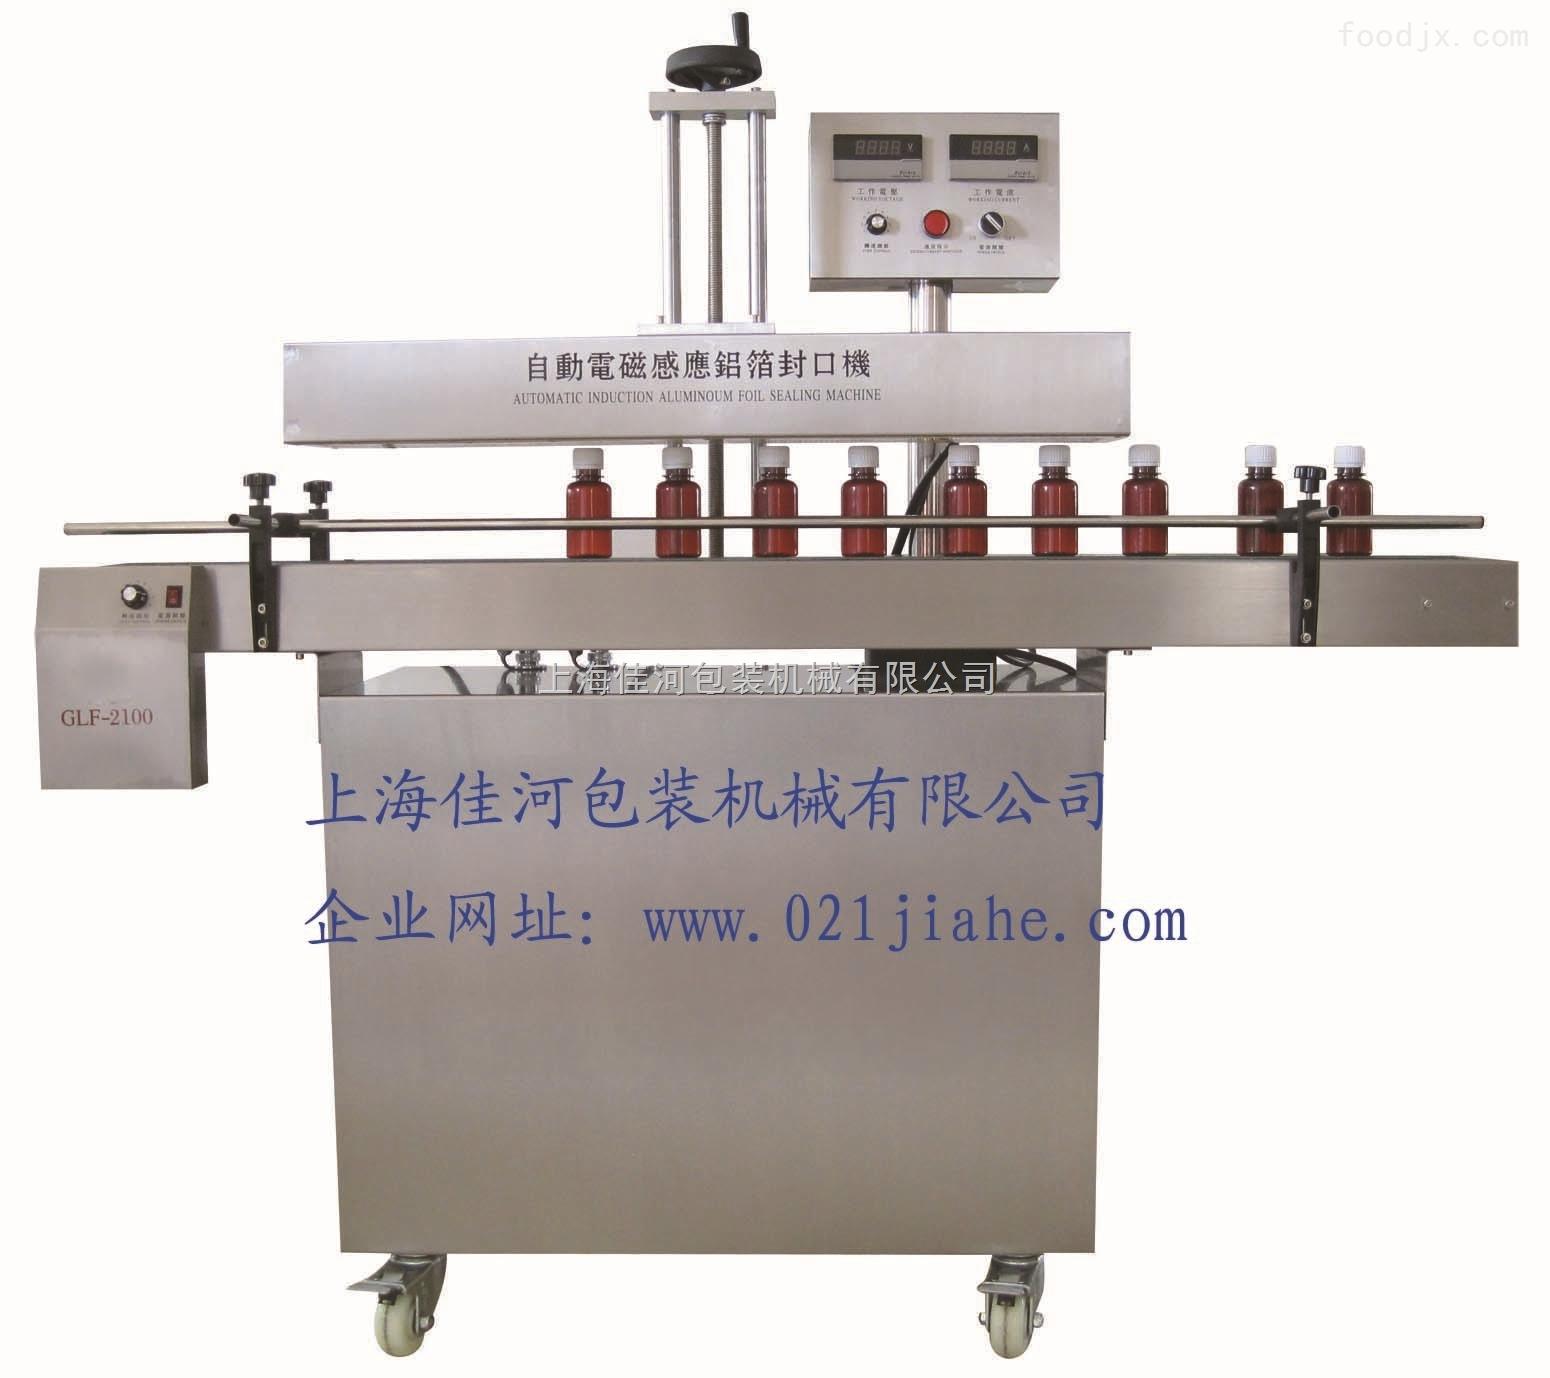 GLF-2100-*   2100    自动超大口径  电磁感应铝箔封口机   药瓶封口机 塑料瓶